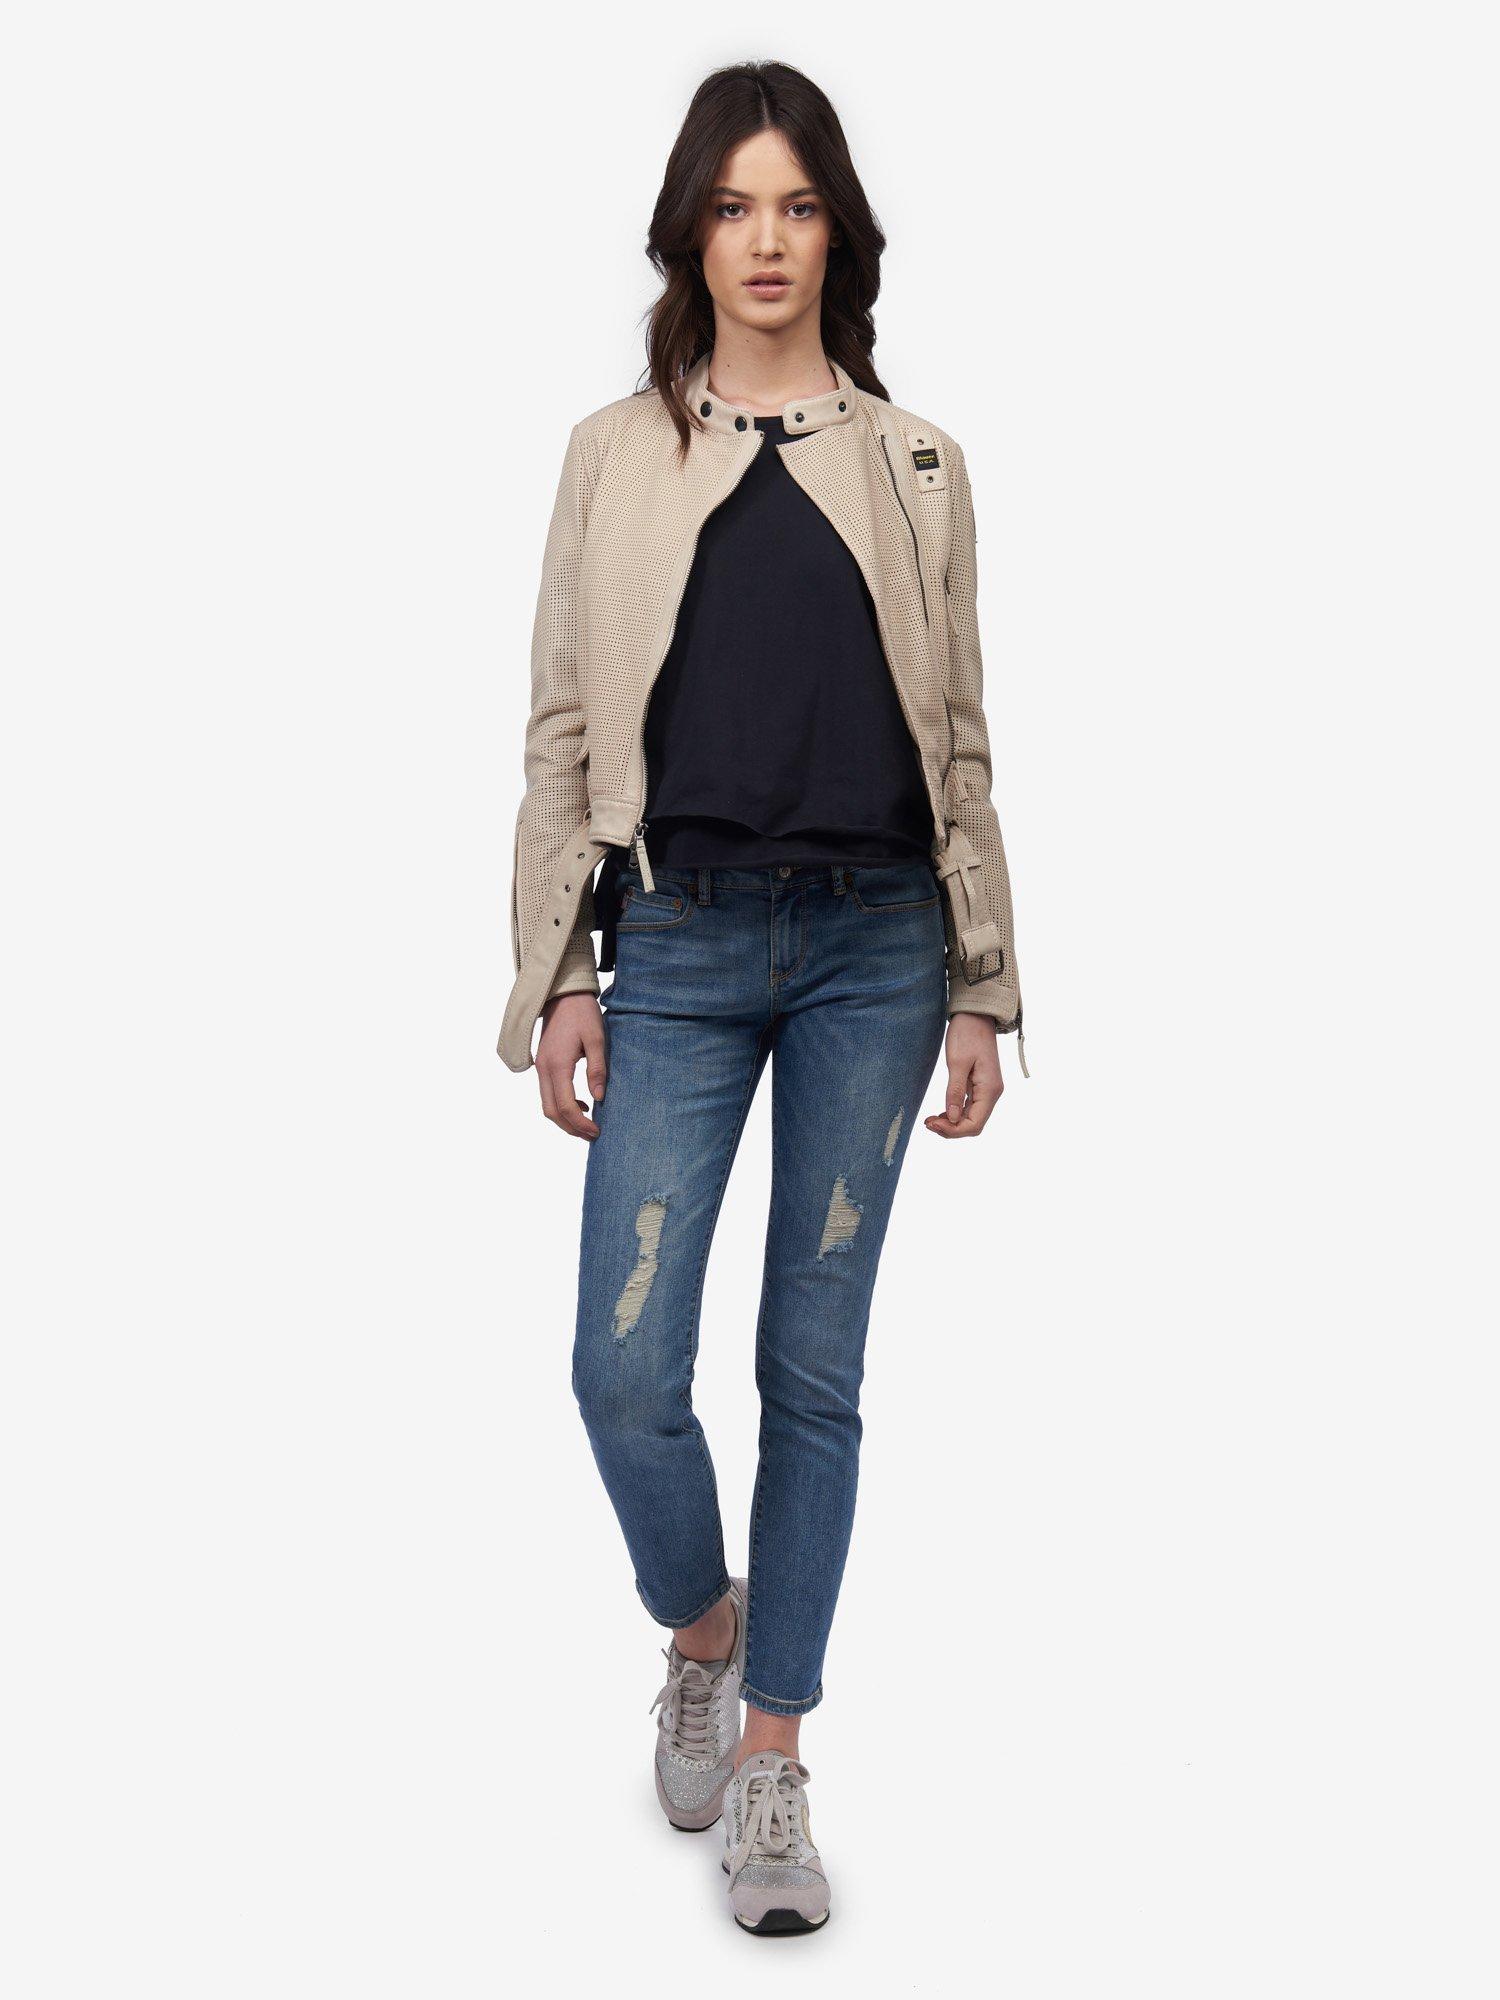 59011b6cca21 Blauer ® Donna - Acquista online la Collezione Donna | Blauer USA